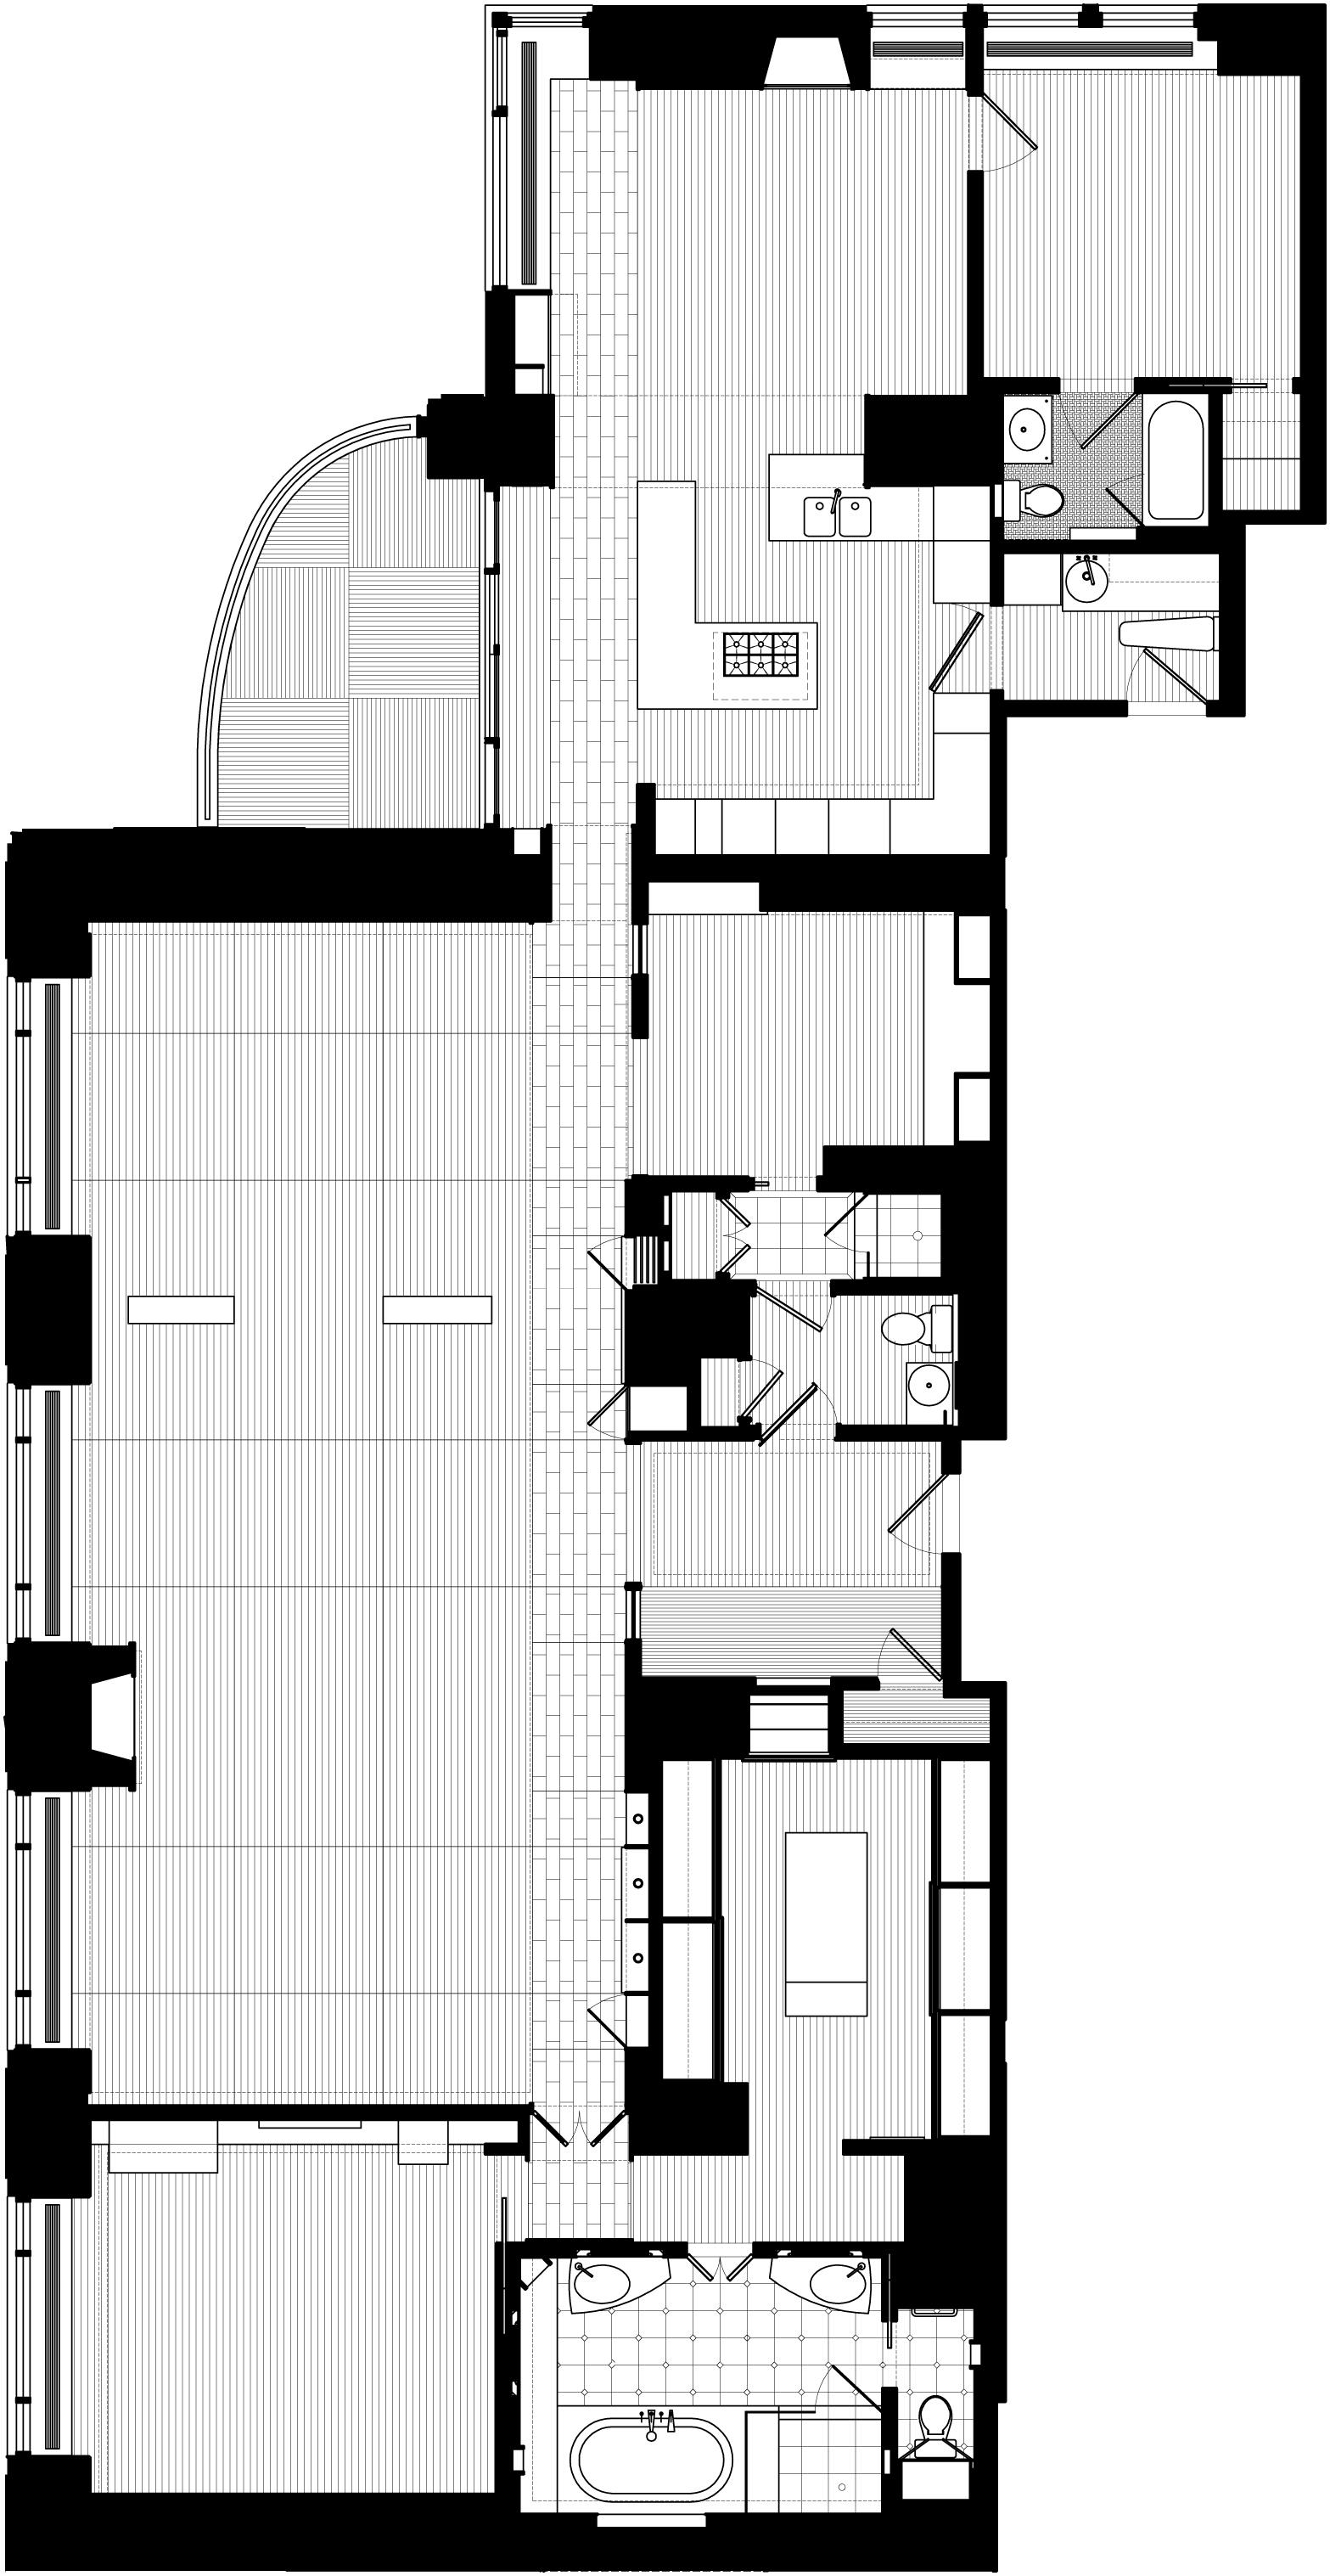 plan with flooring.jpg